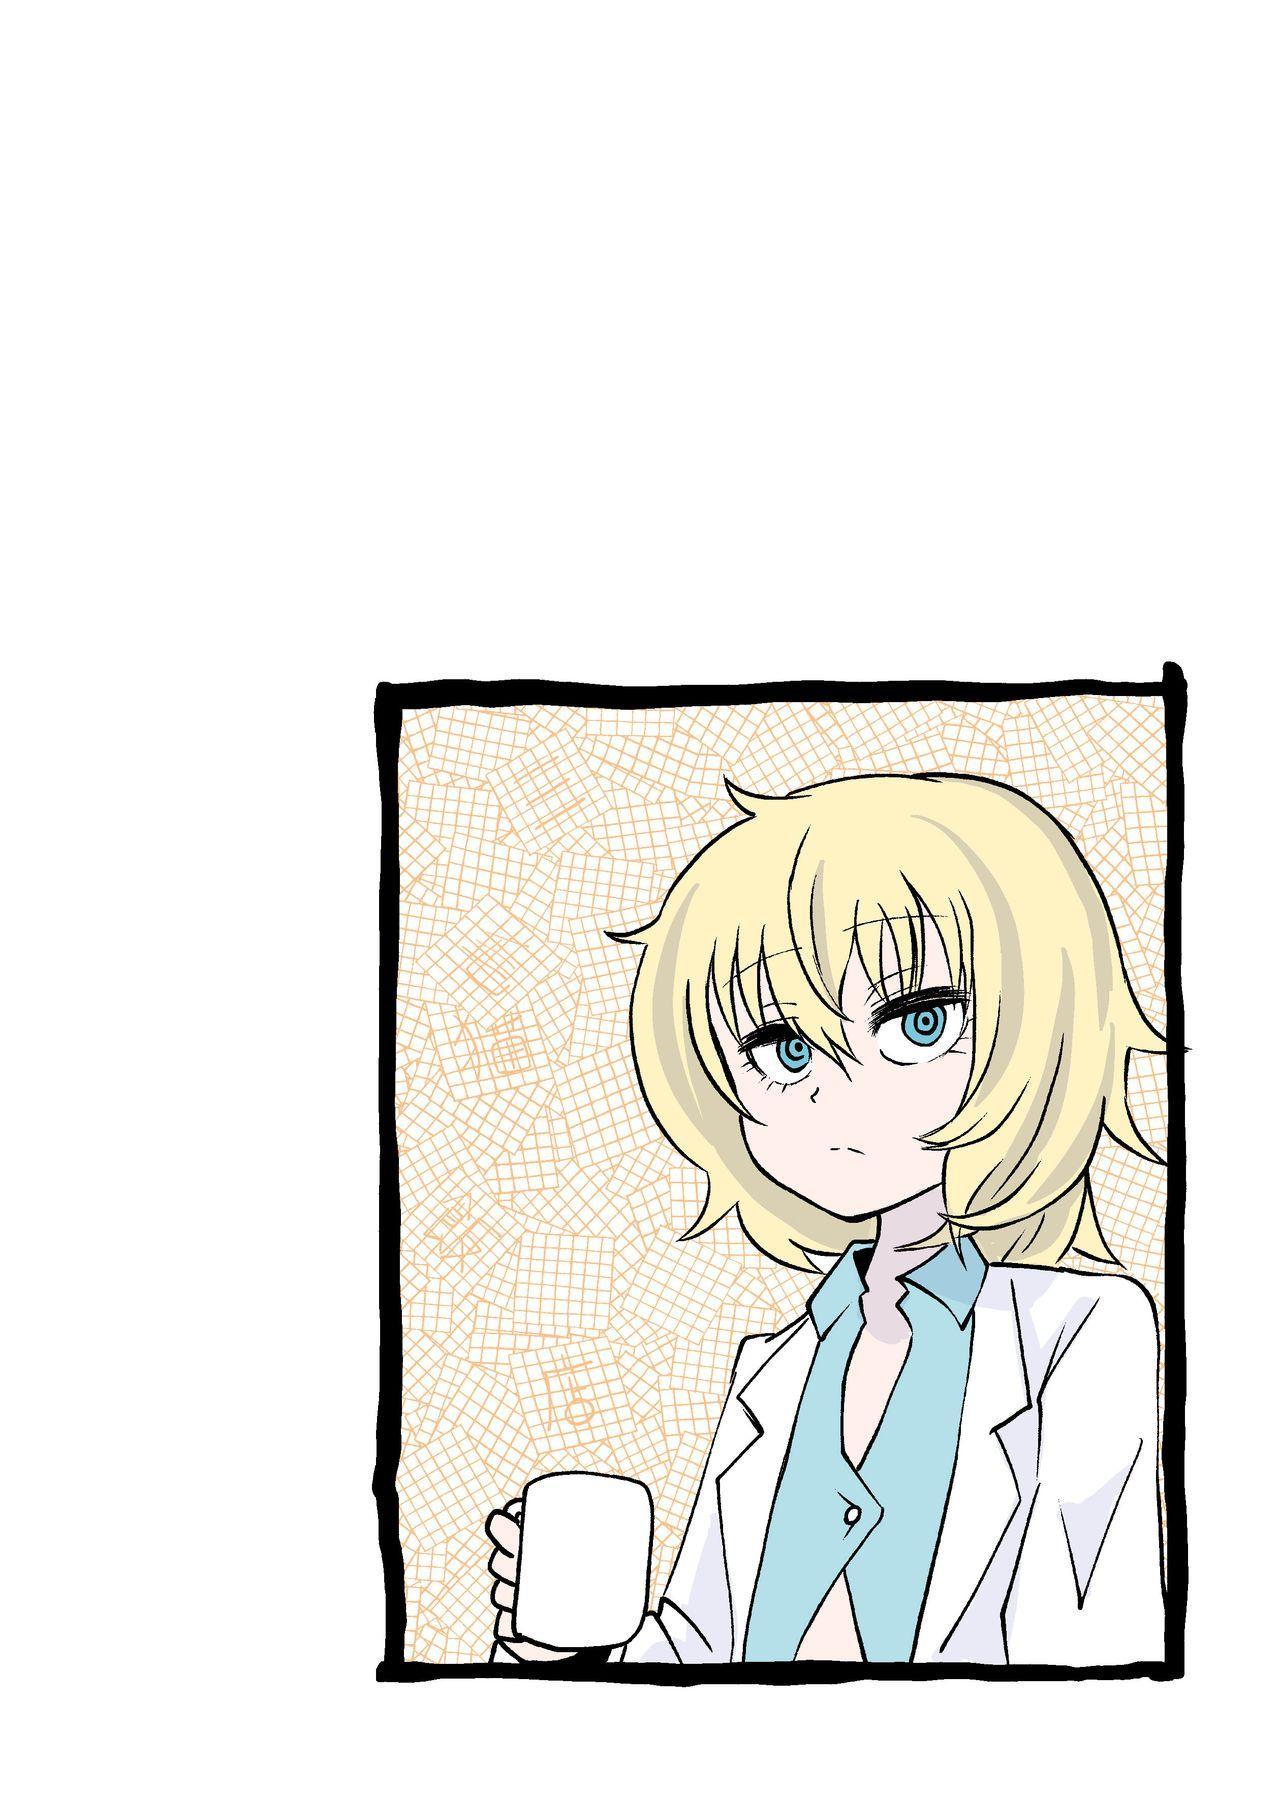 Ponkotsu Futa Robot Laboratory Σ 27